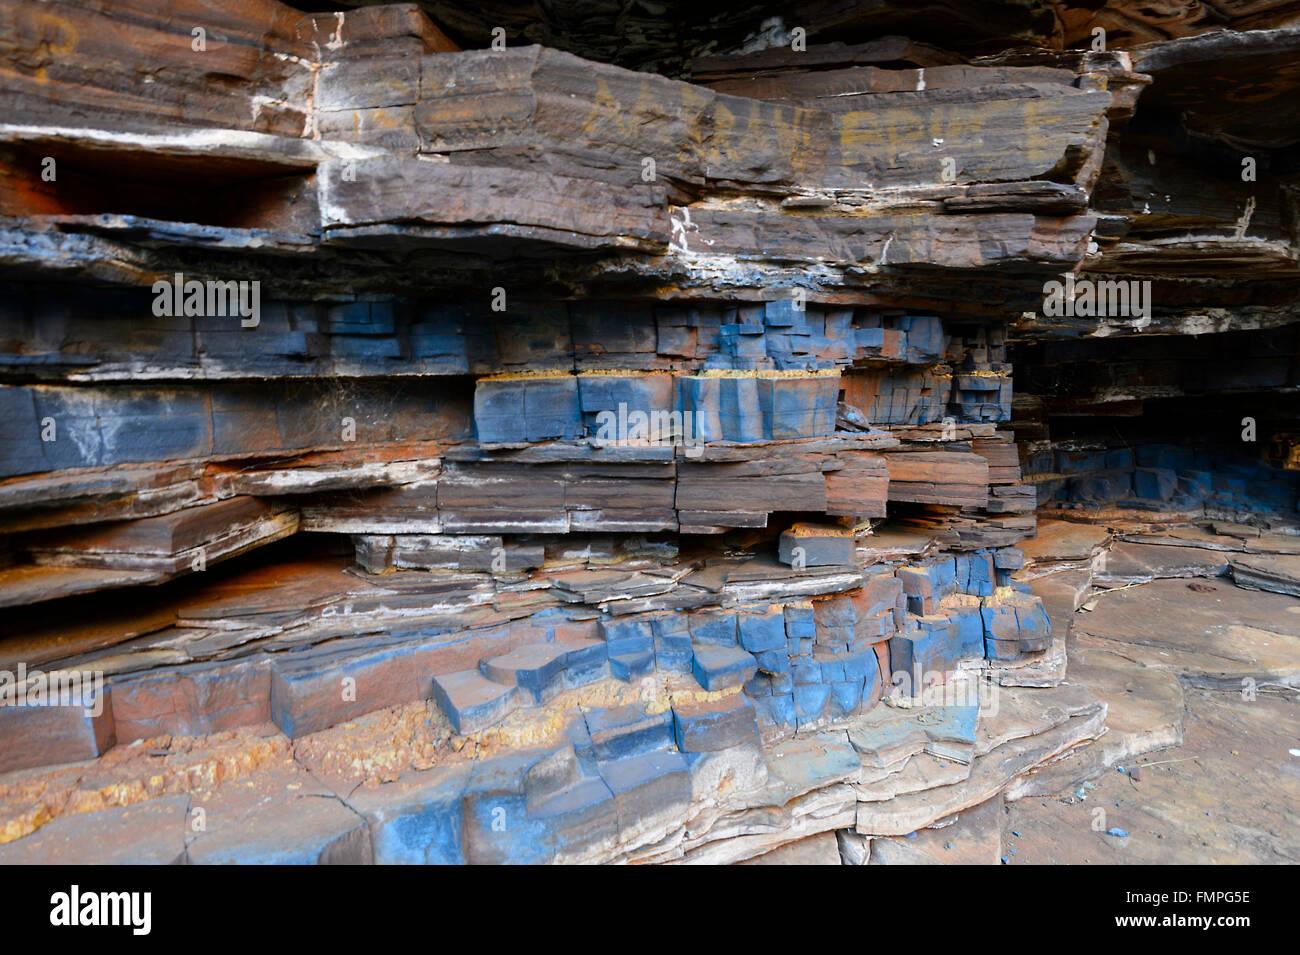 veins-of-blue-asbestos-crocidolite-circu